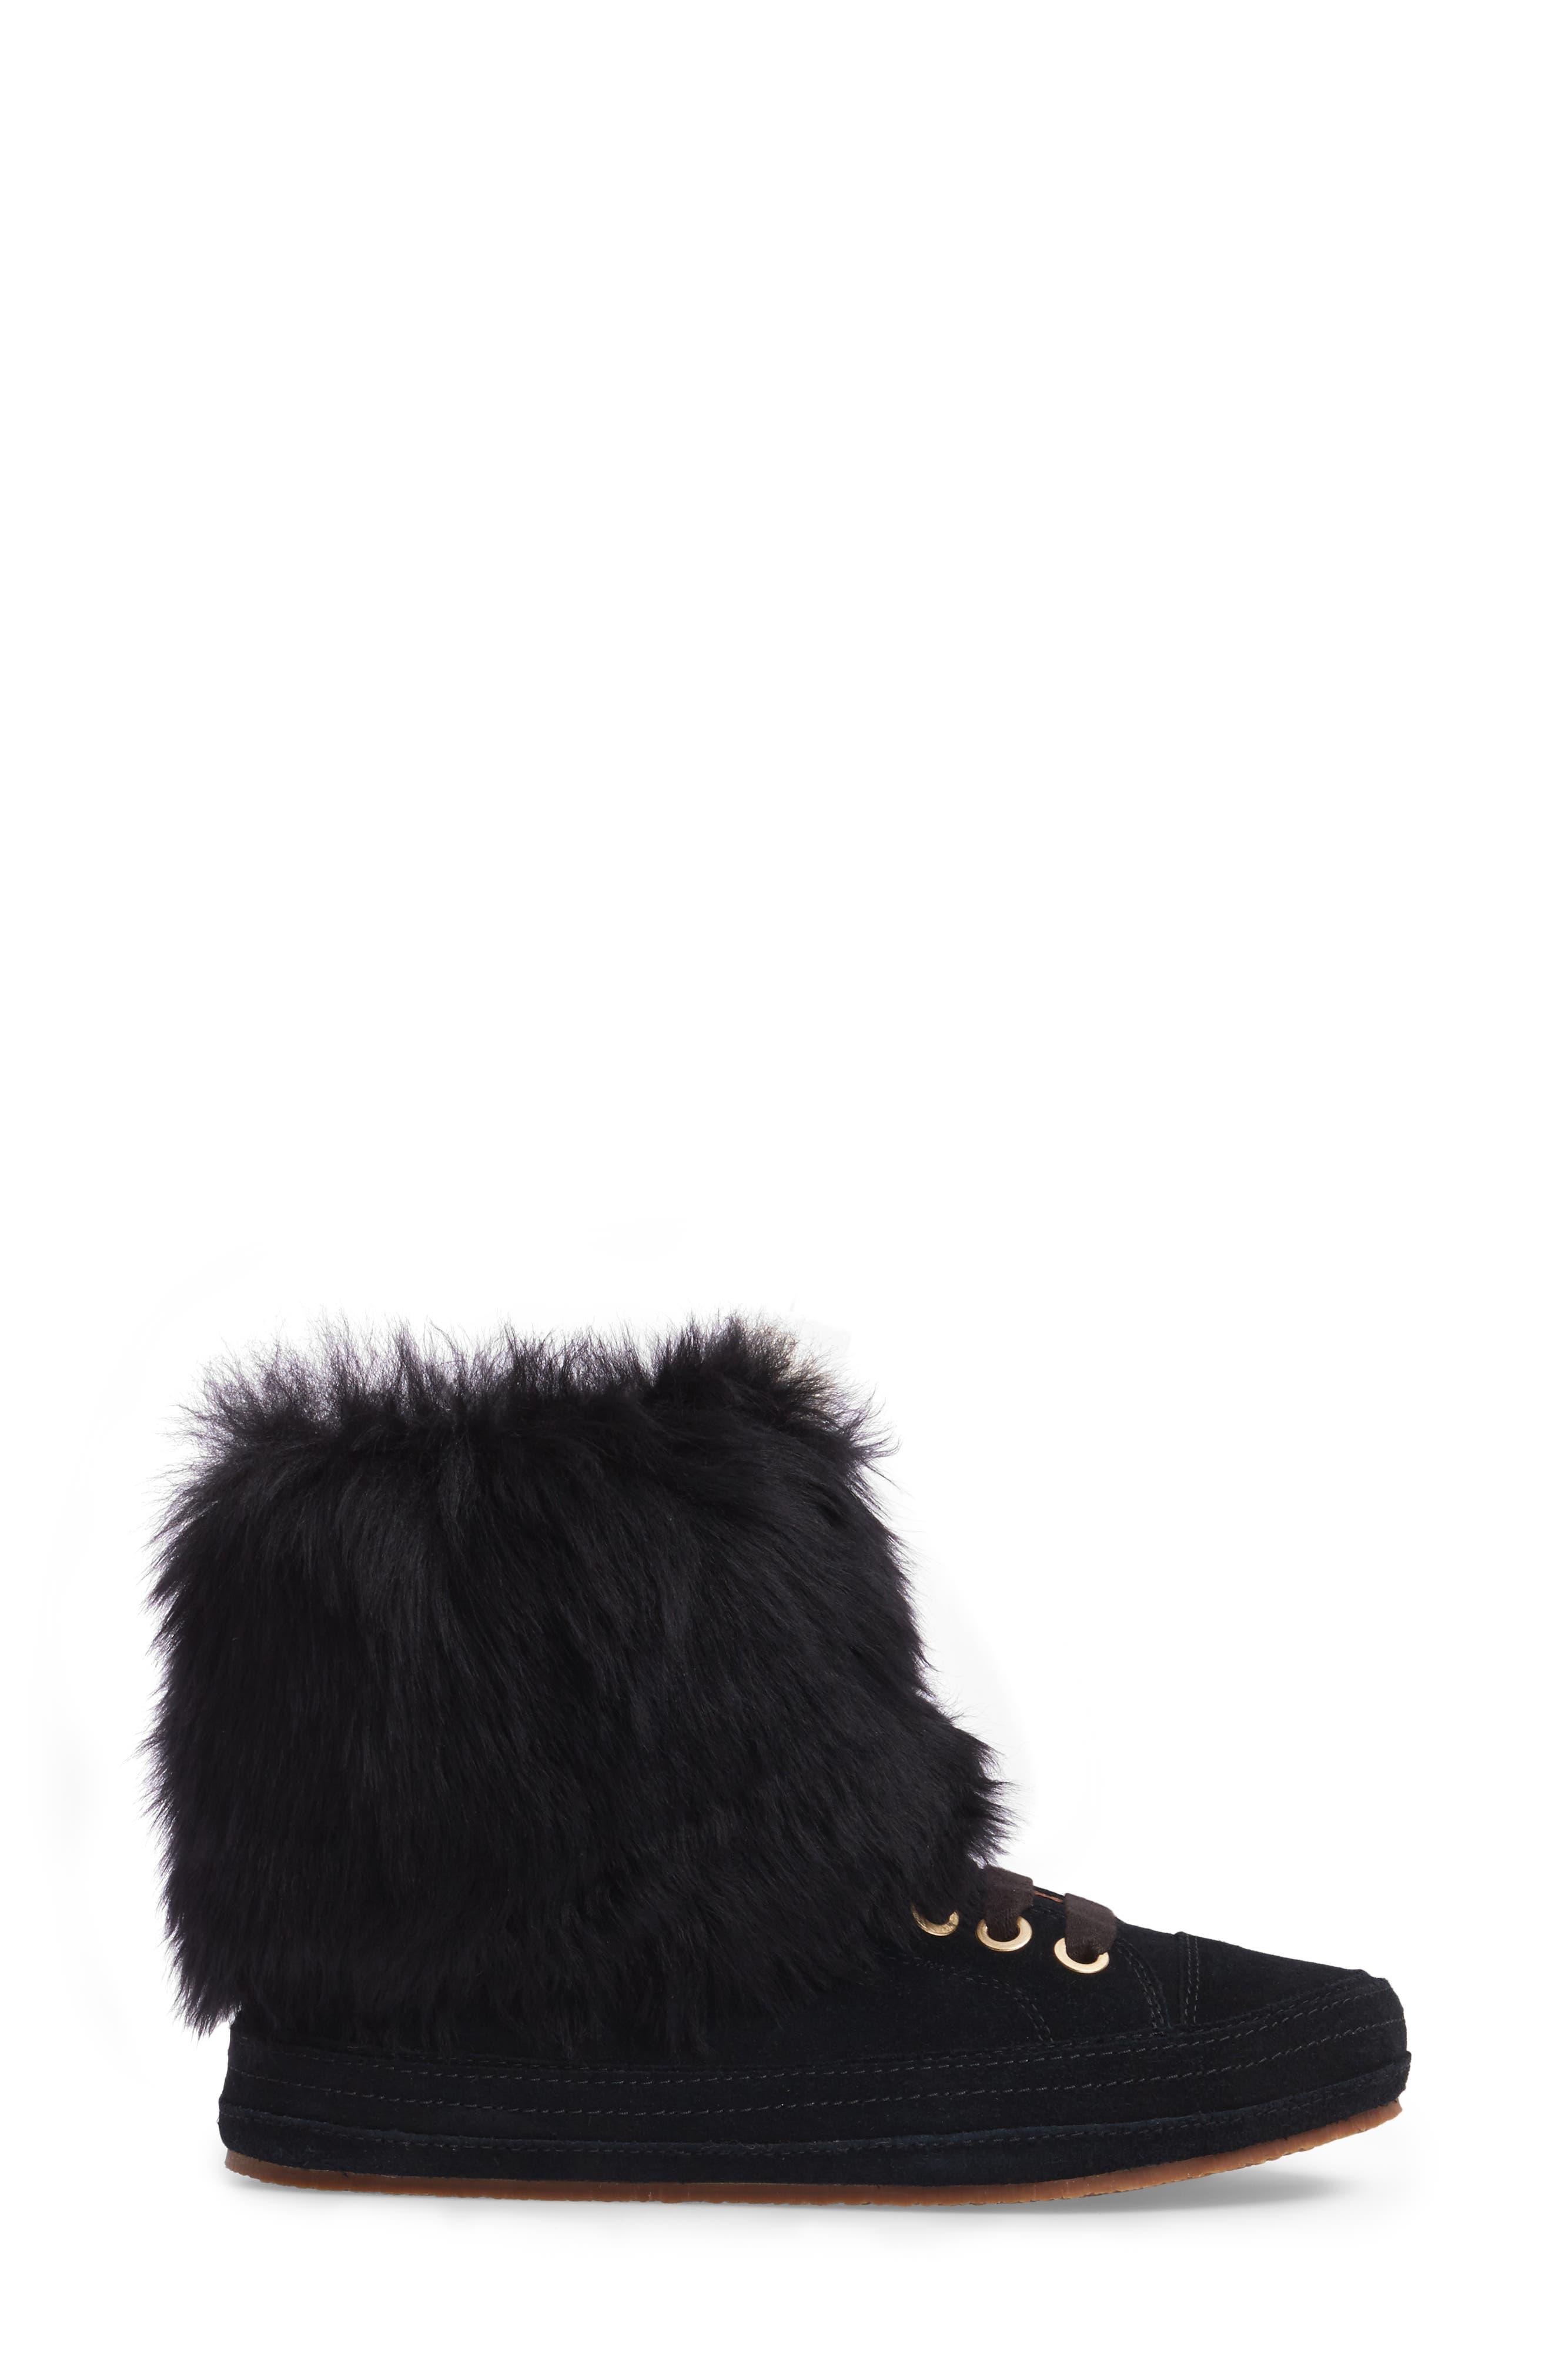 Antoine Fur Cuff Sneaker,                             Alternate thumbnail 3, color,                             001